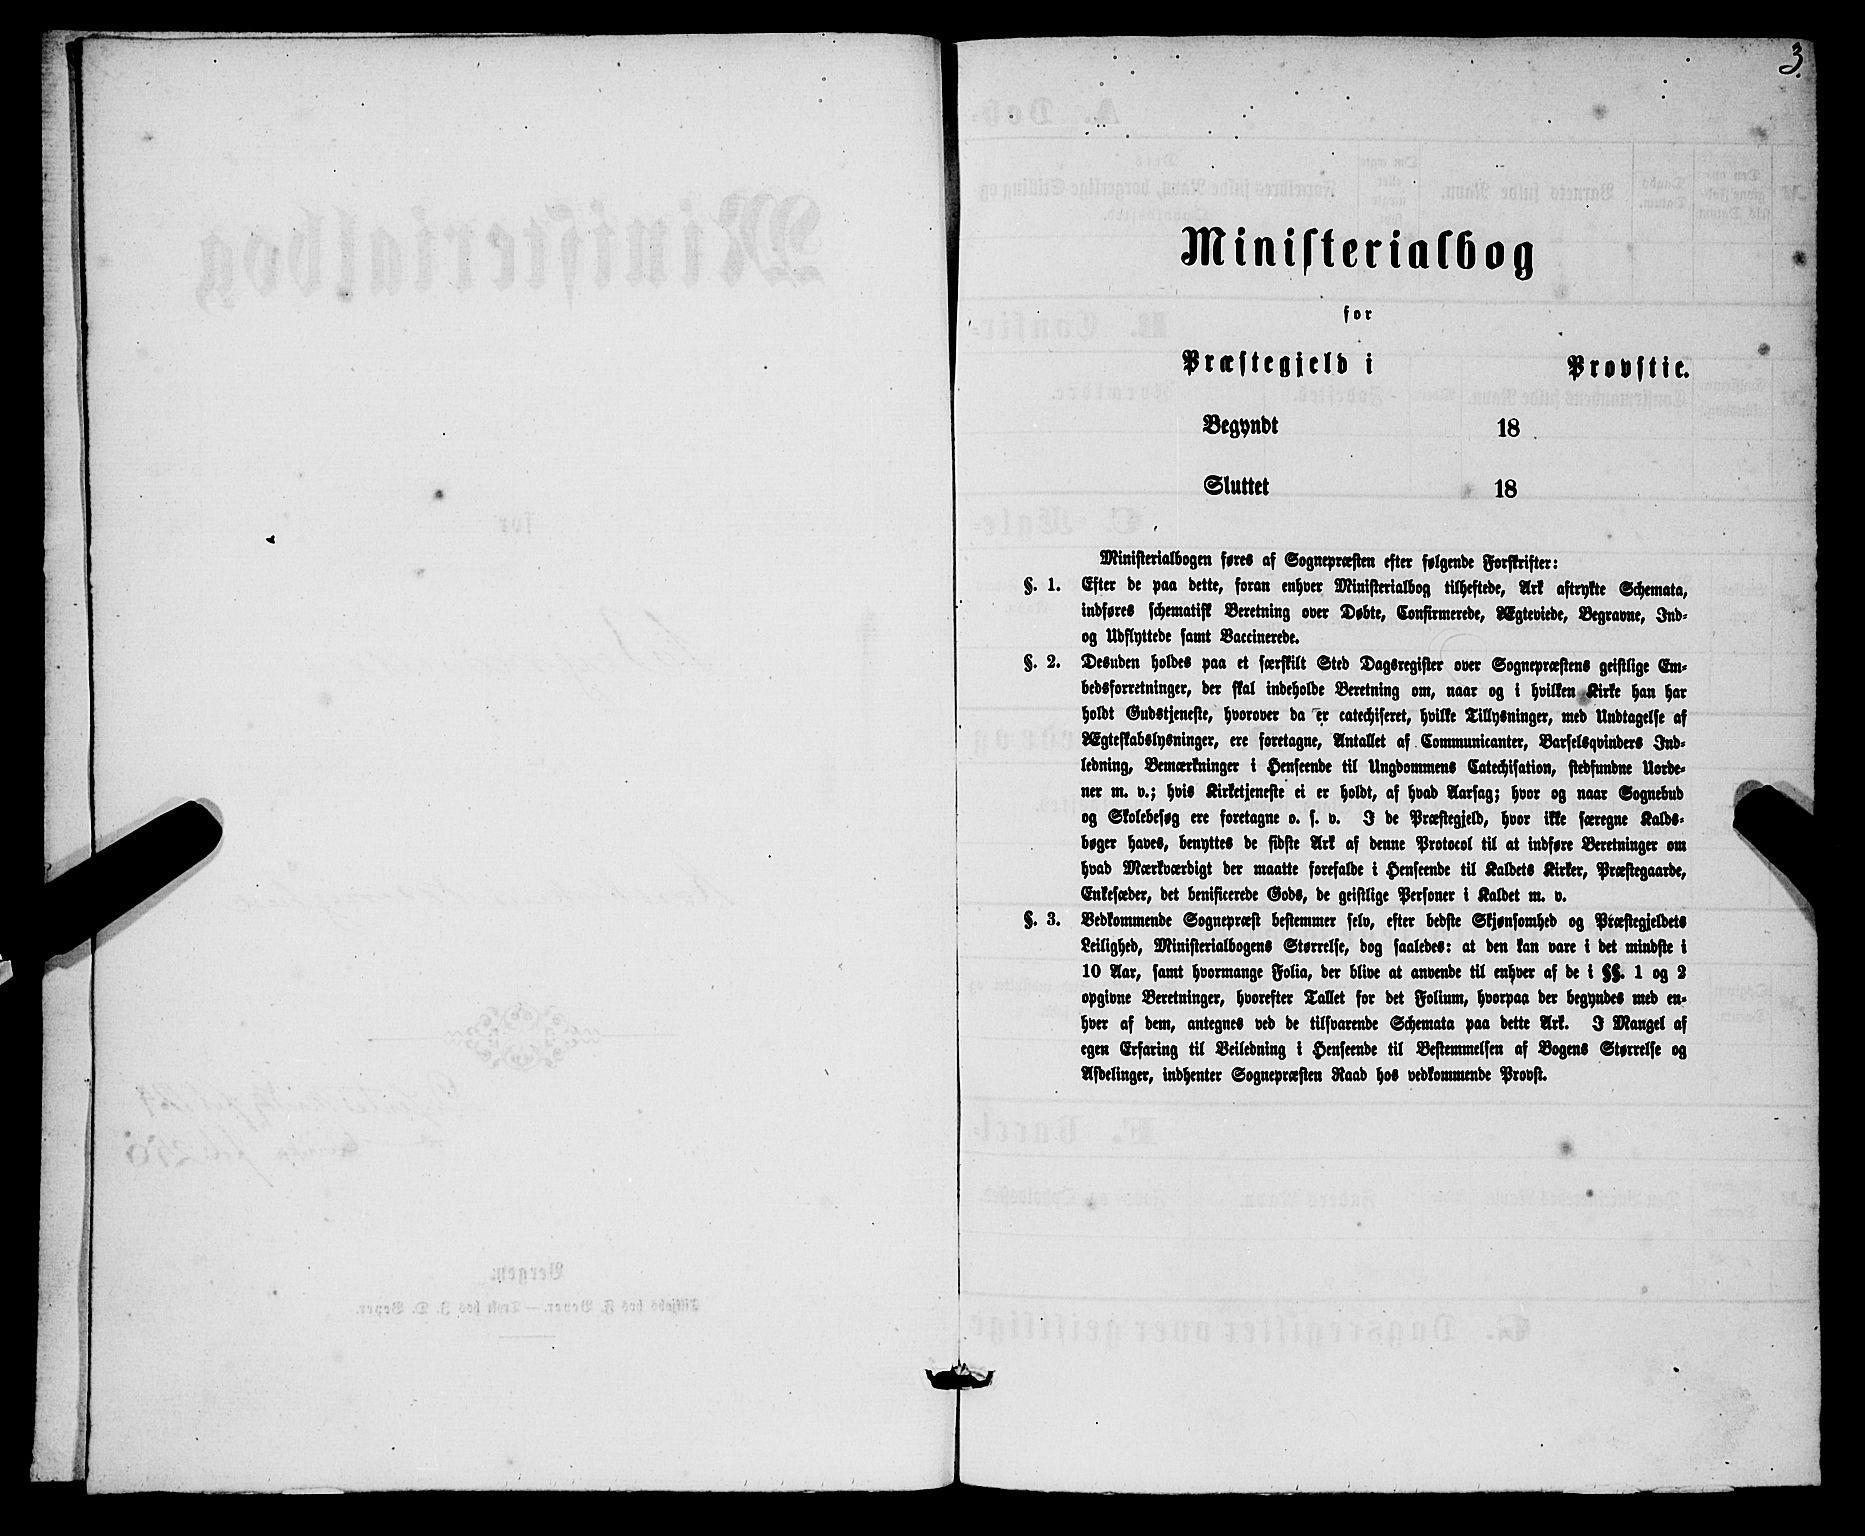 SAB, Korskirken Sokneprestembete, H/Haa/L0045: Ministerialbok nr. E 3, 1863-1875, s. 3